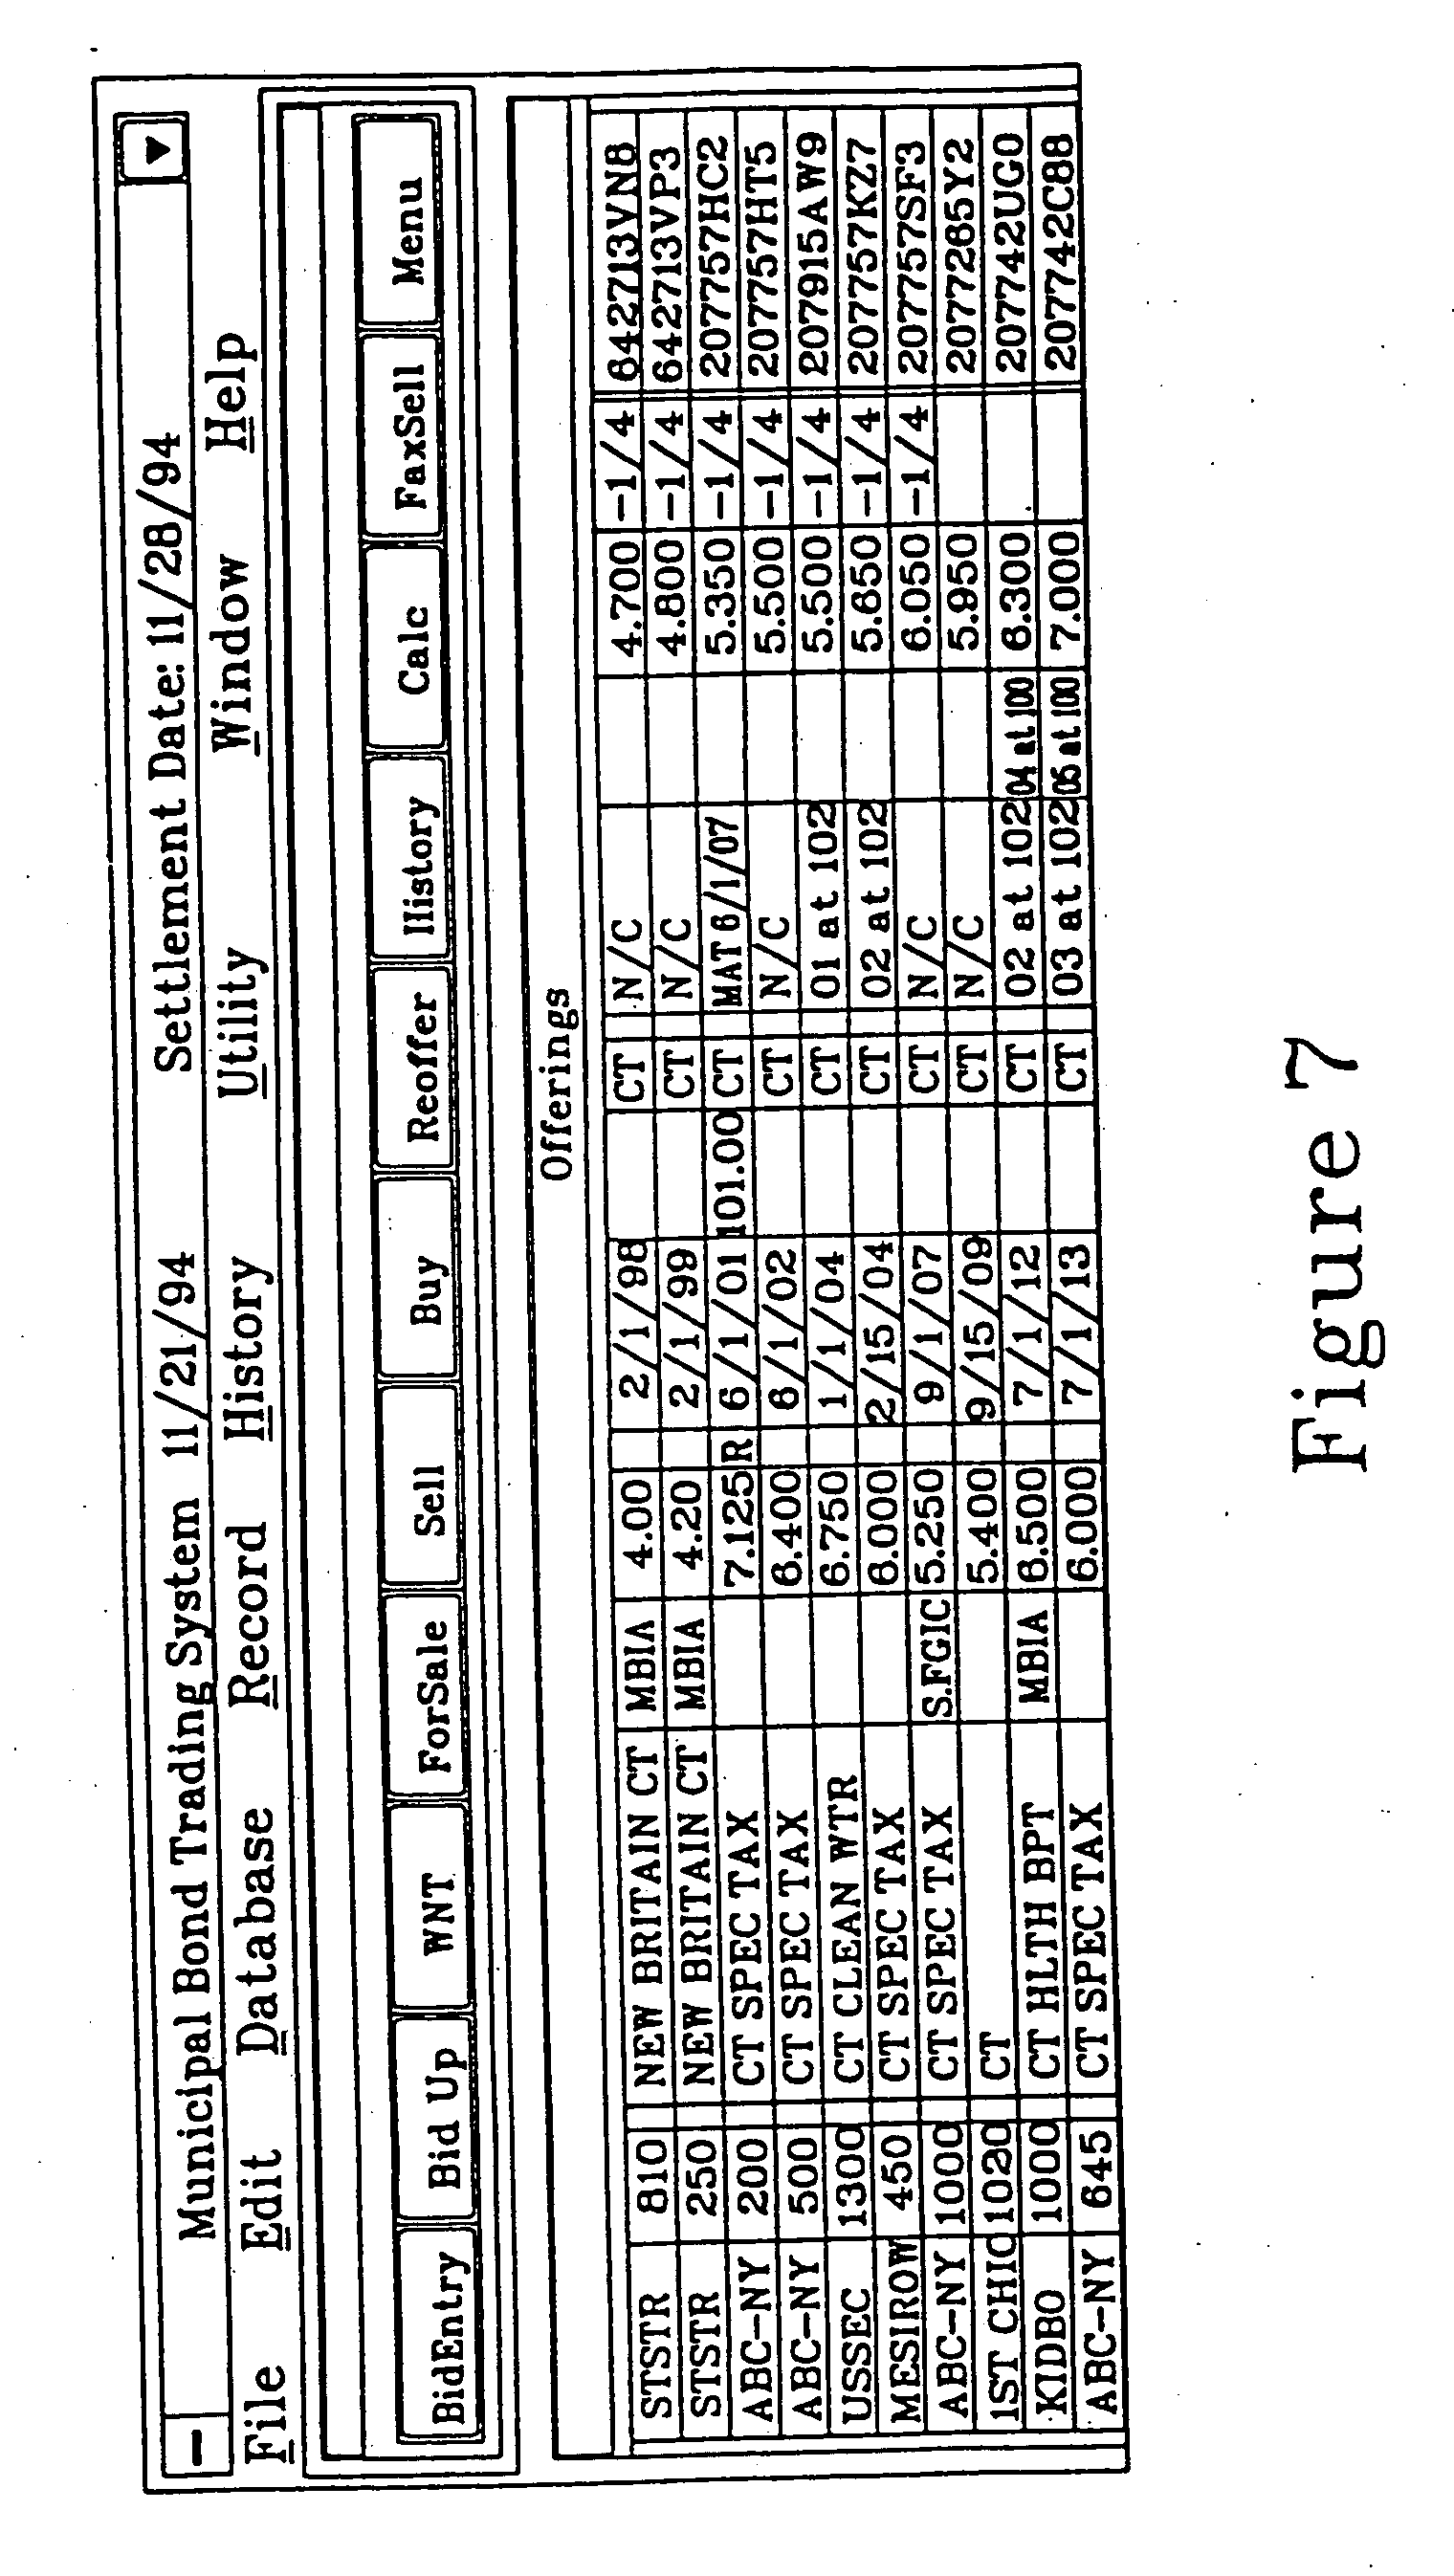 Electronic bond trading system